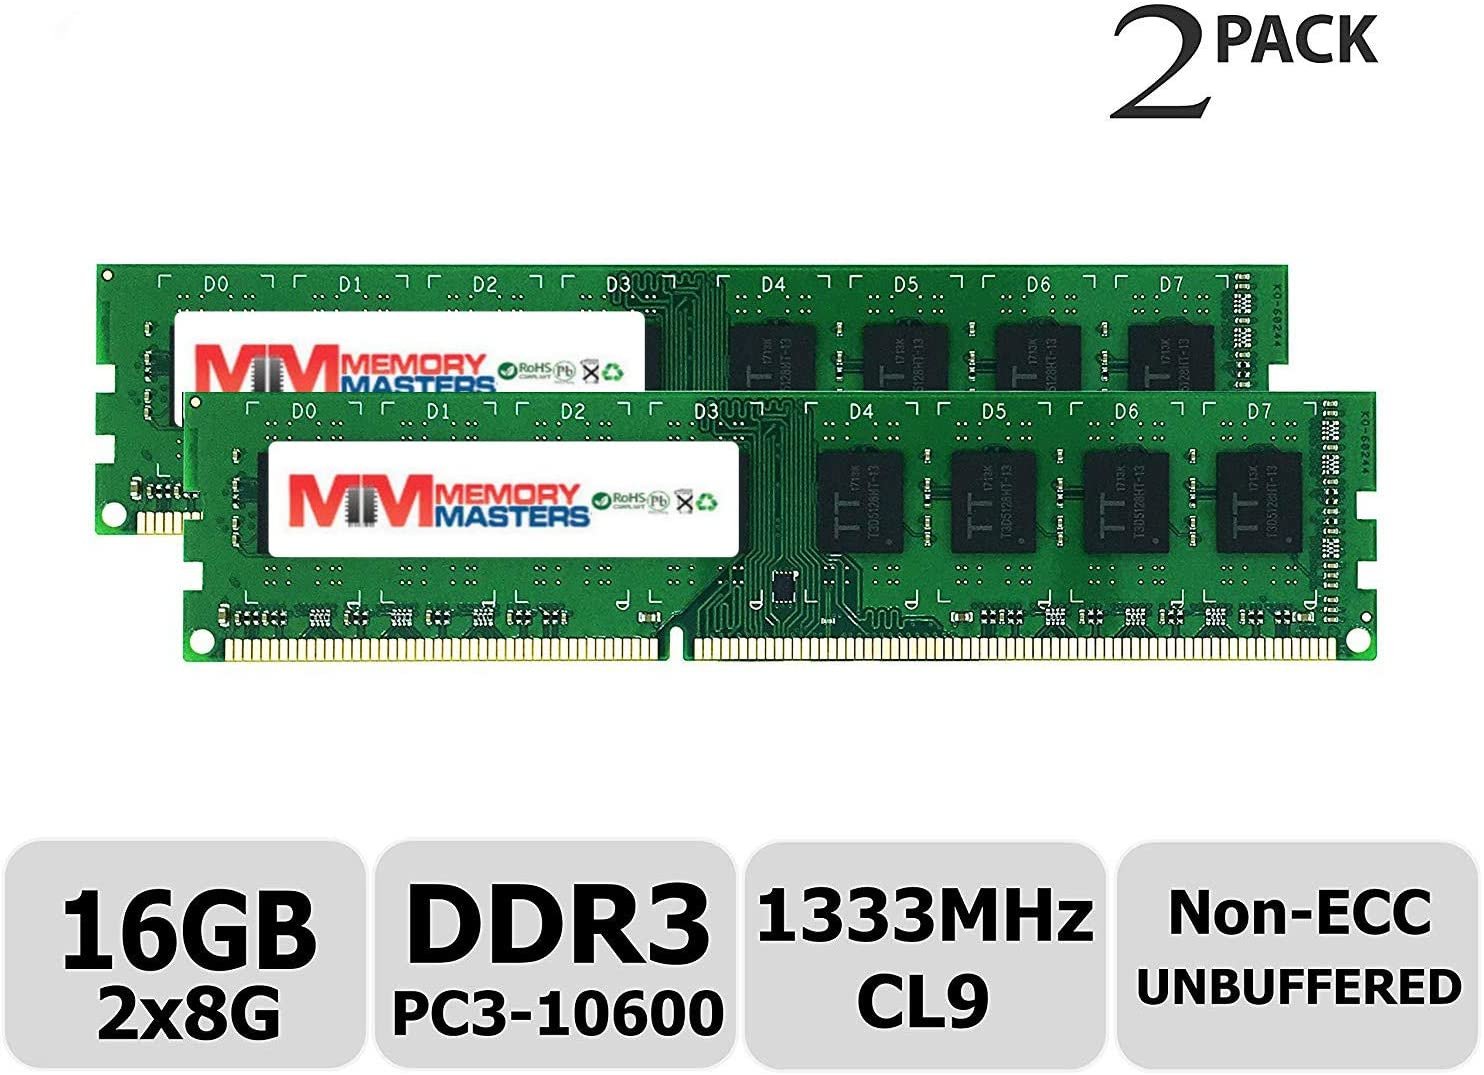 PARTS-QUICK Brand 2GB Memory Upgrade for Gigabyte G1.Sniper 5 Motherboard DDR3 PC3-10600 1333MHz DIMM Non-ECC Desktop RAM